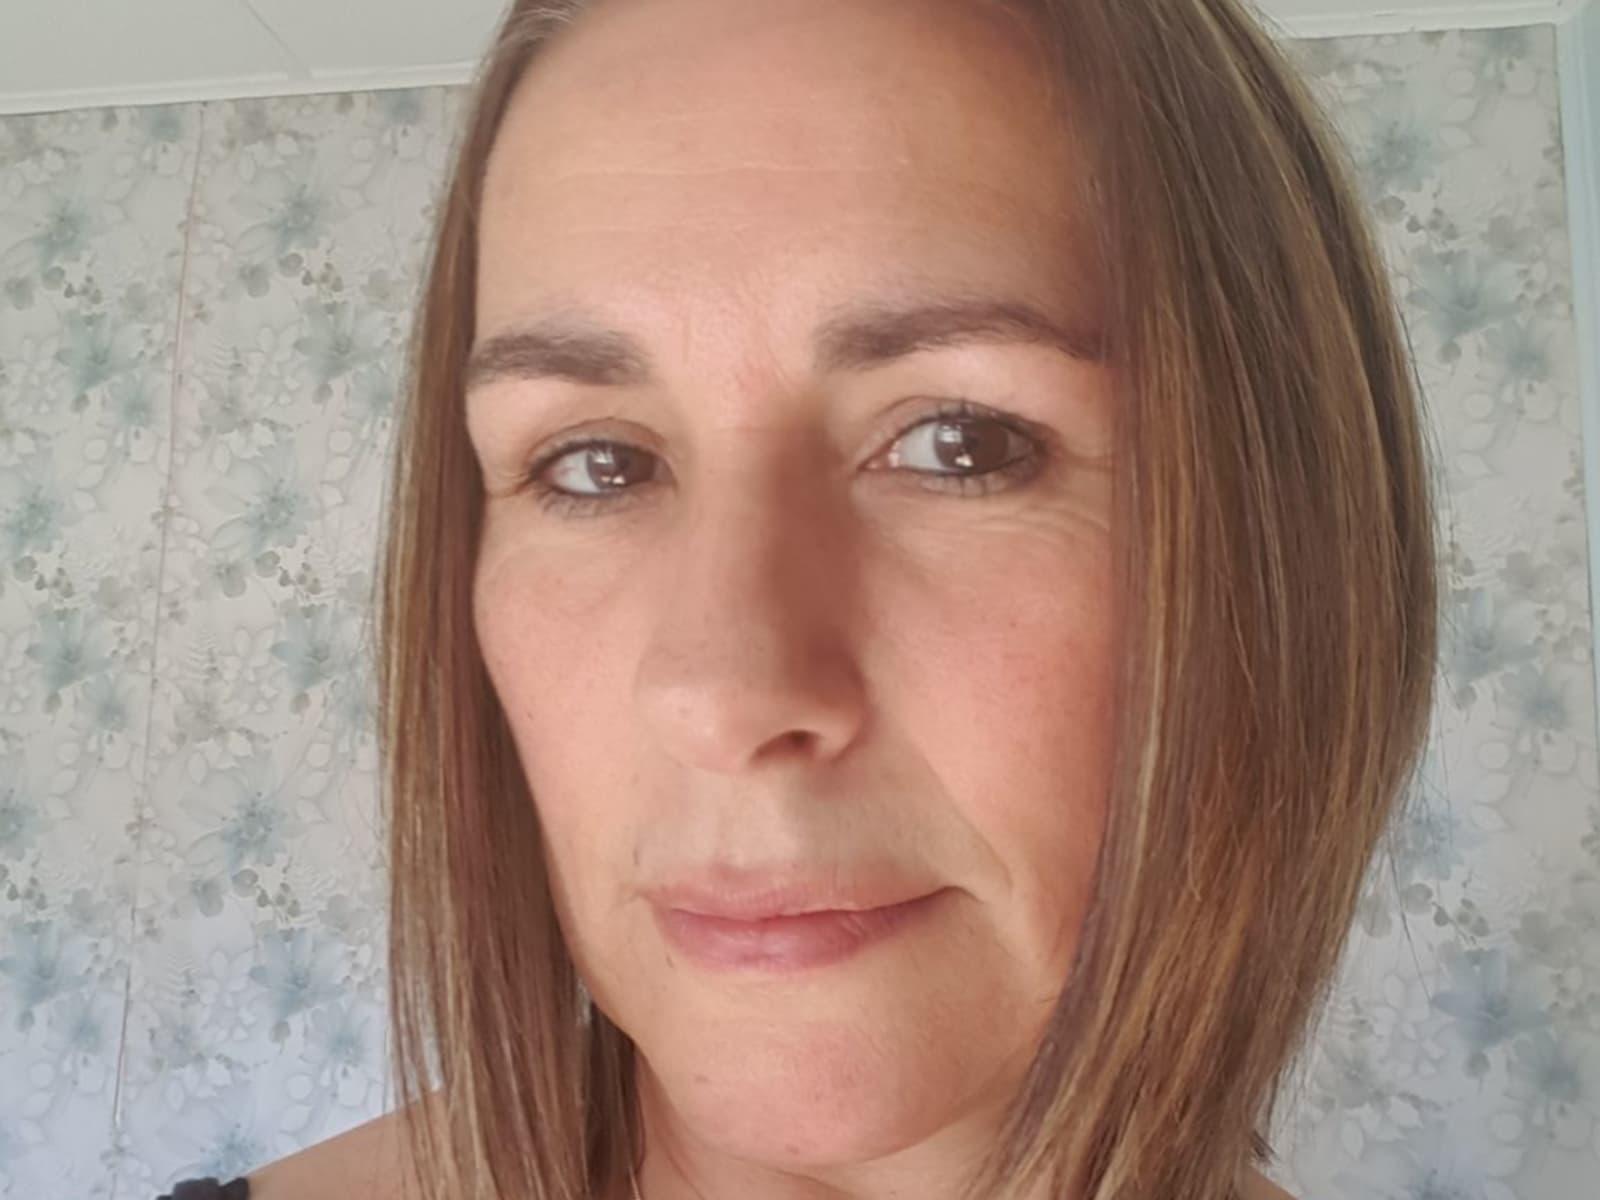 Annalisa from Hopetoun, Western Australia, Australia